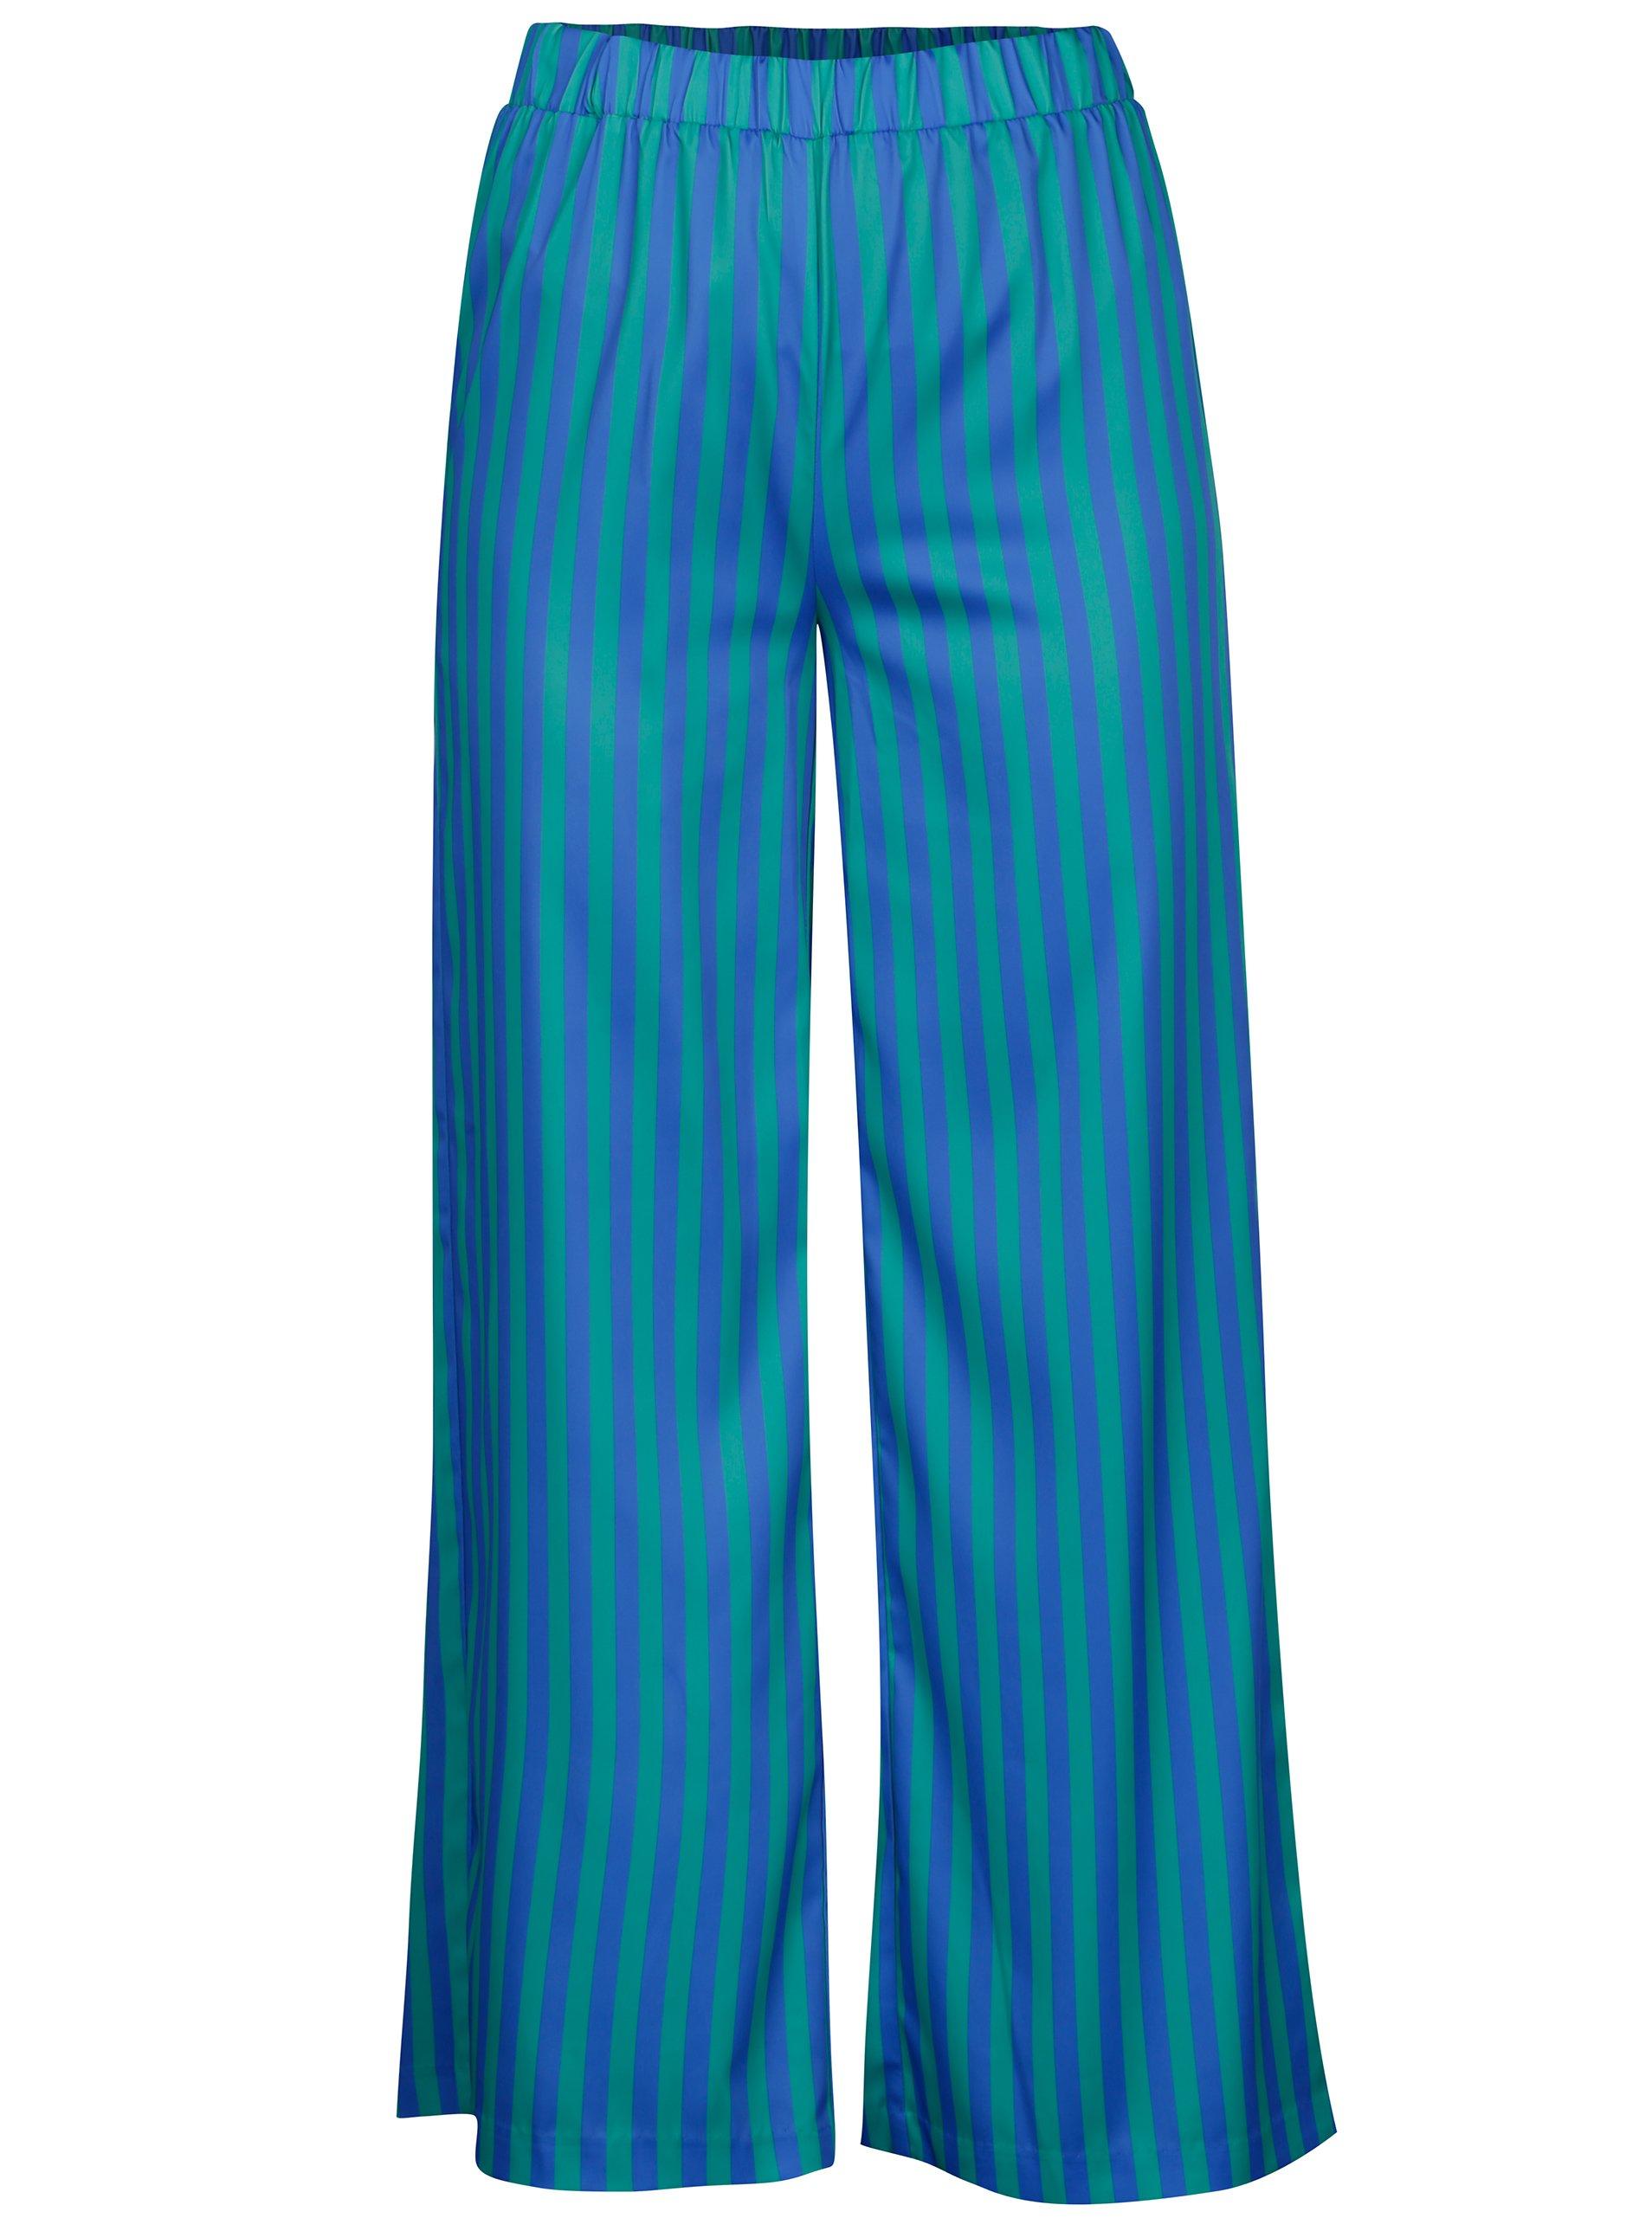 Zeleno-modré pruhované voľné nohavice s vysokým pásom SH Rebucas ... f4e29f47581